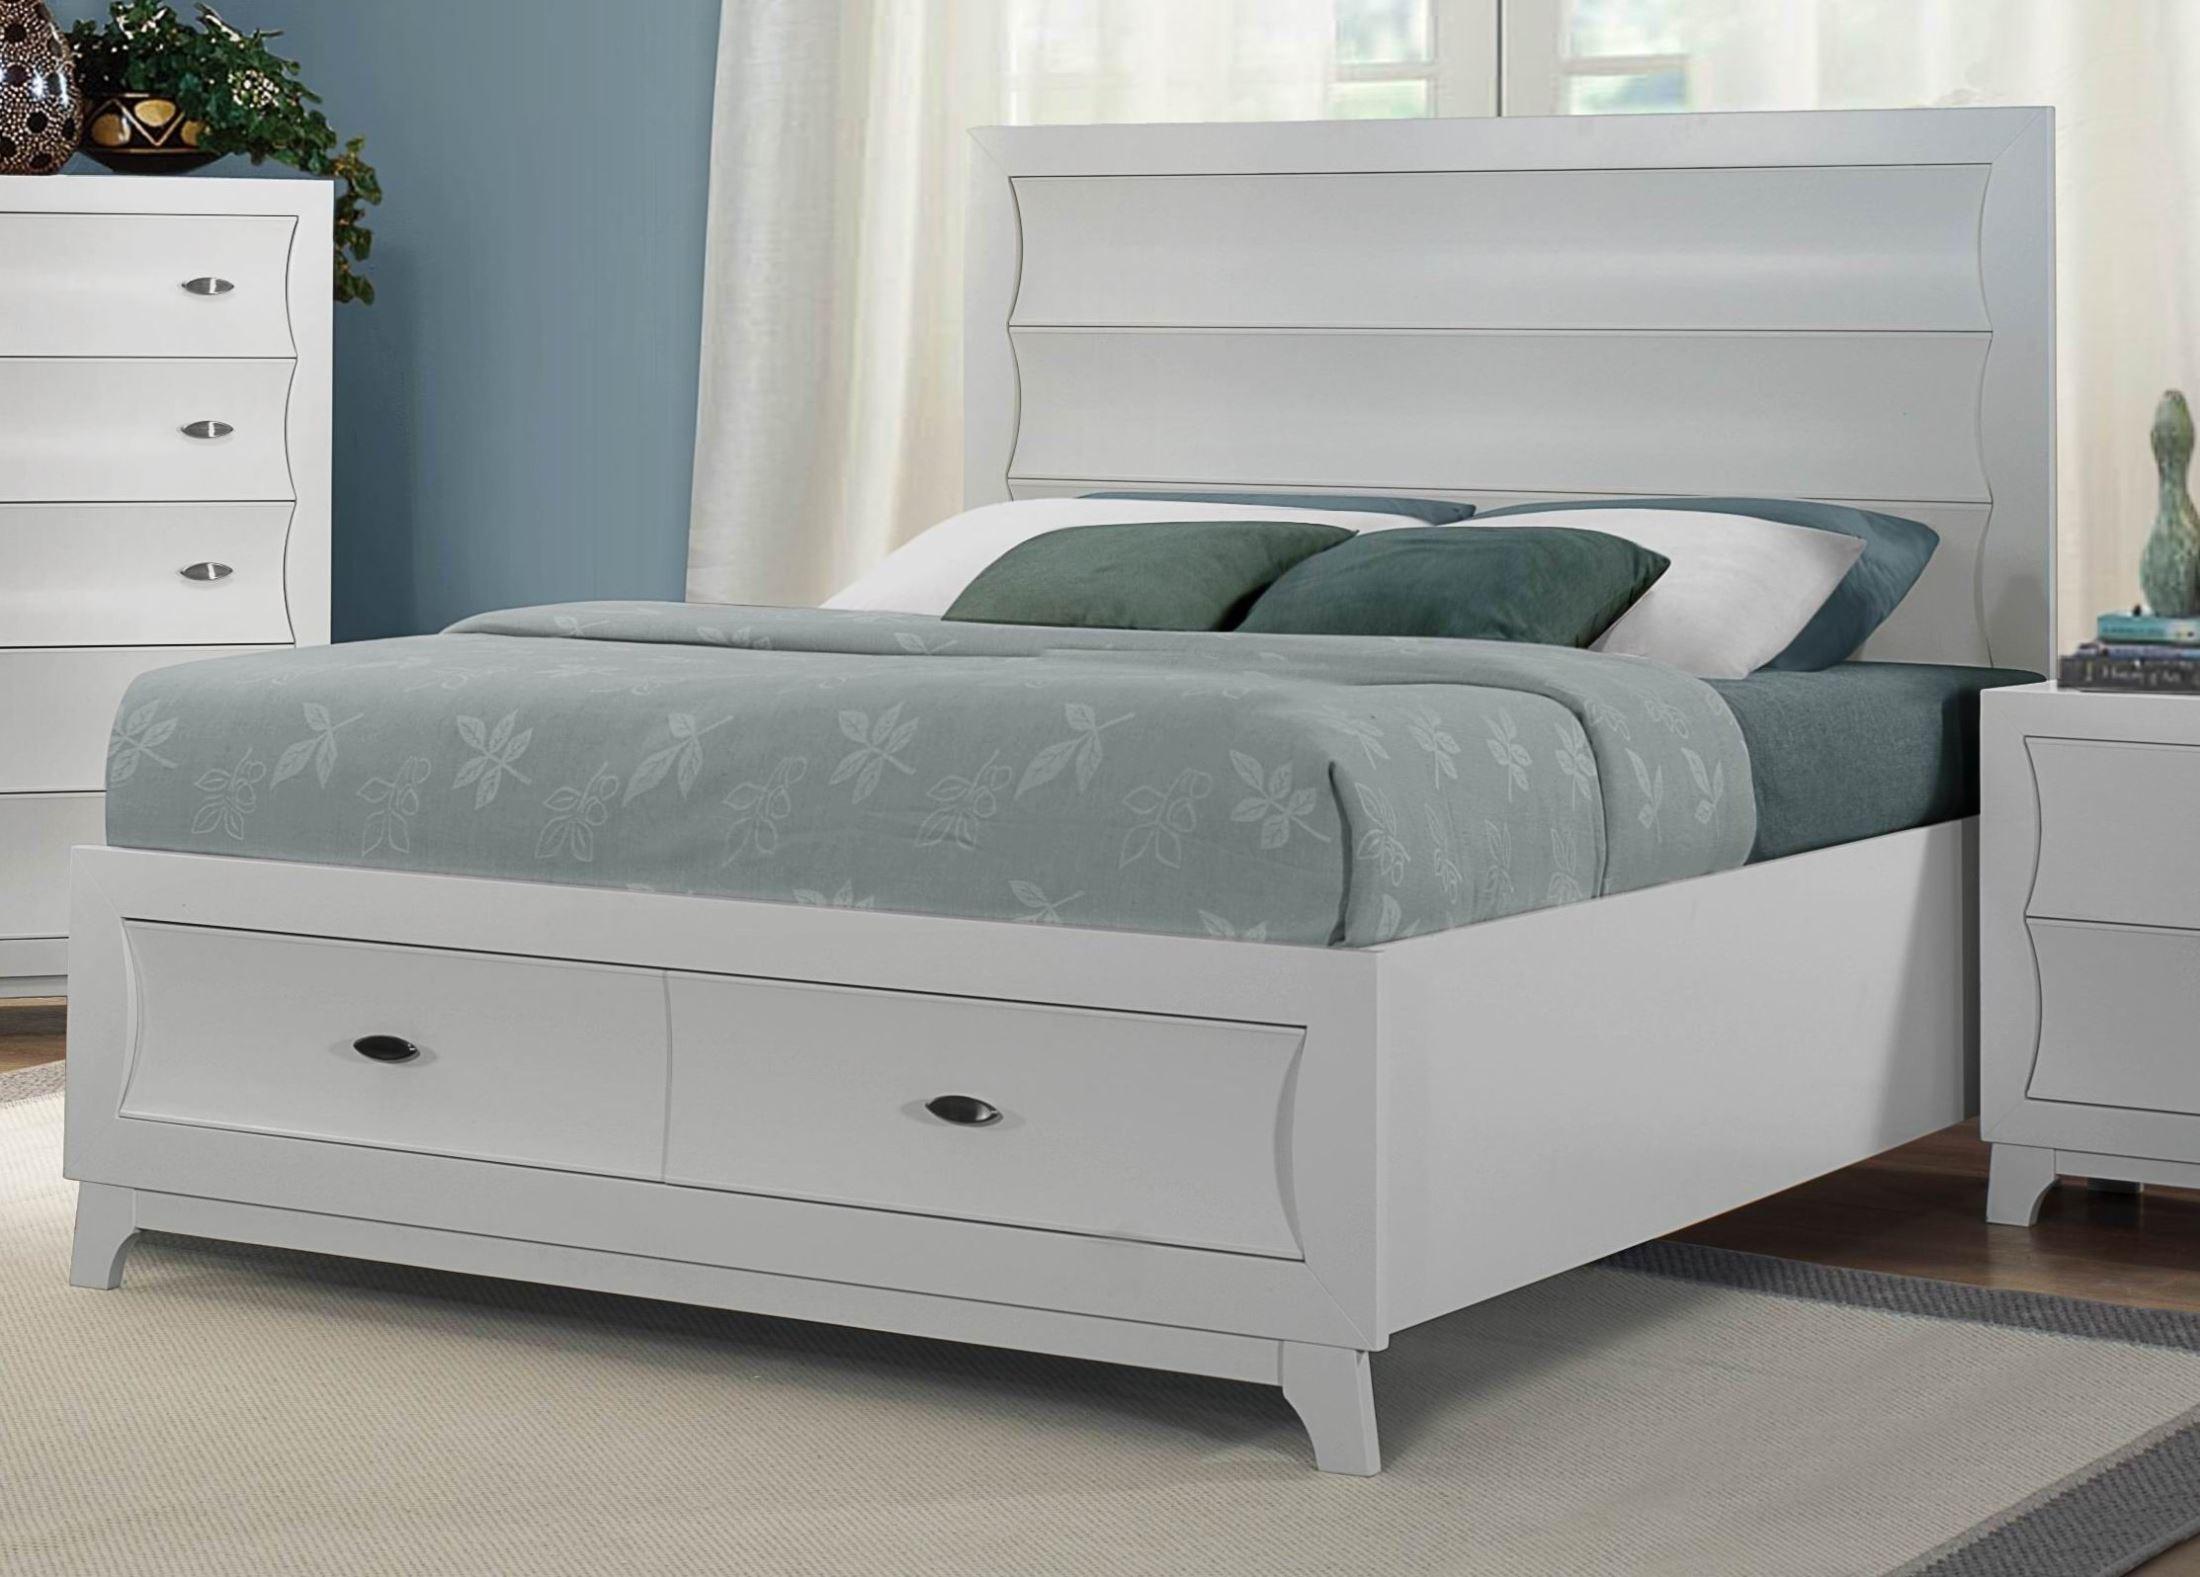 Zandra White King Storage Bed From Homelegance 2262kw 1ek